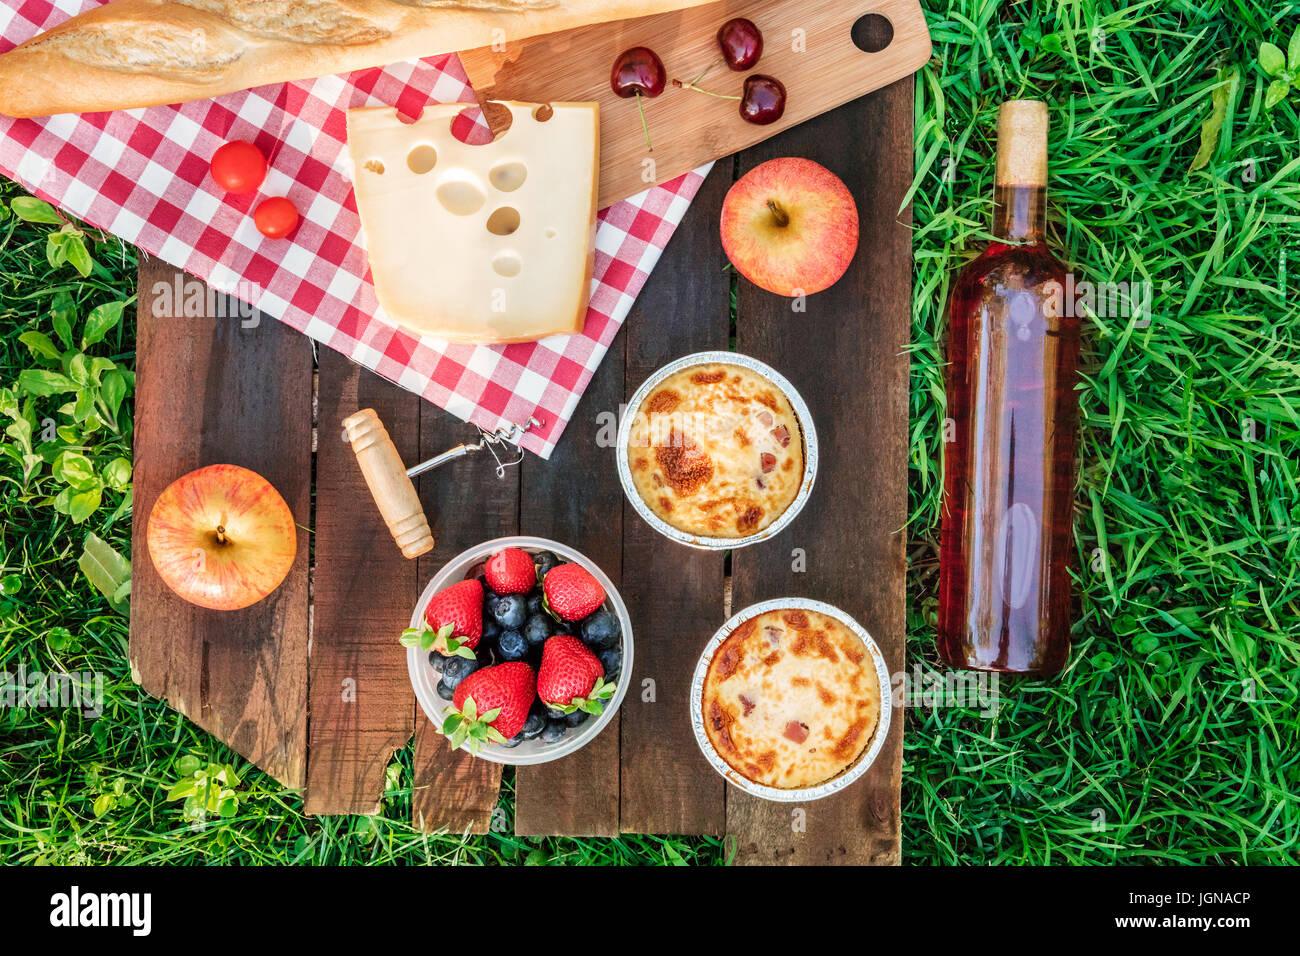 picnic stockfotos picnic bilder alamy. Black Bedroom Furniture Sets. Home Design Ideas